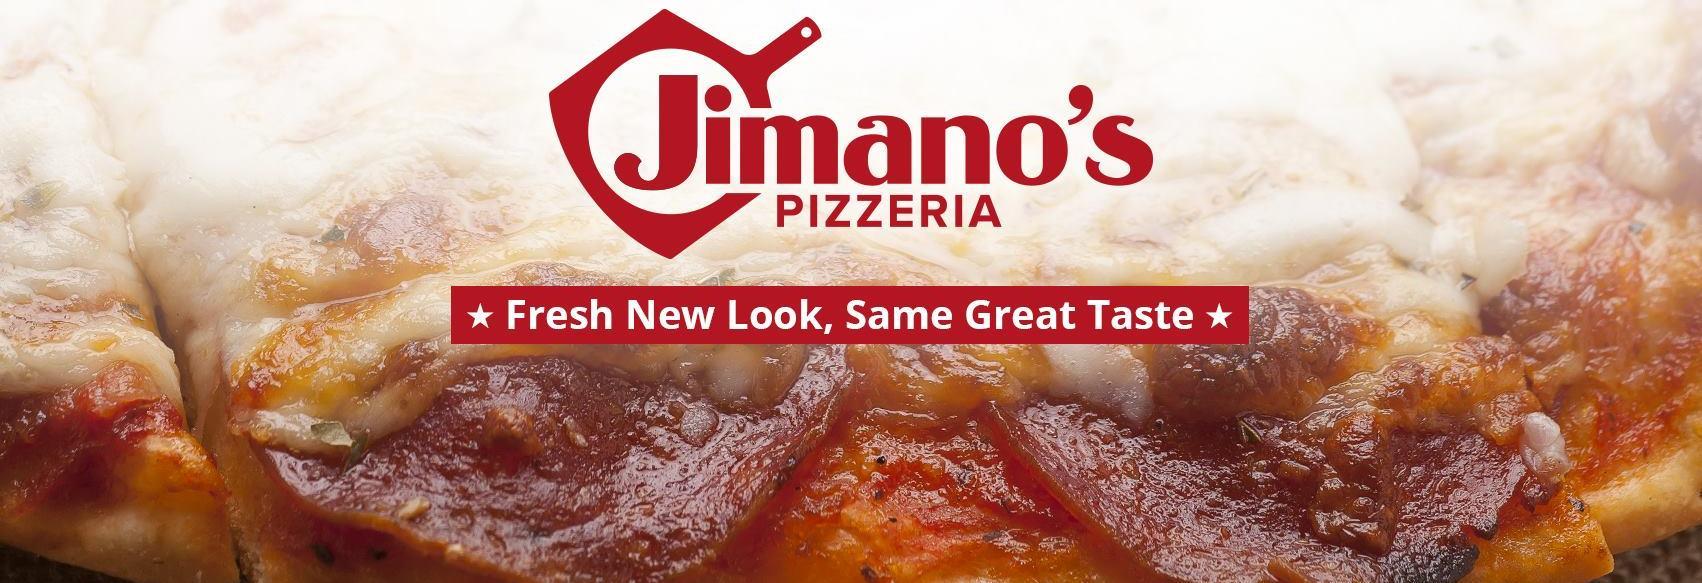 Jimano's Pizzeria PLEASANT PRAIRIE KENOSHA WI pizza